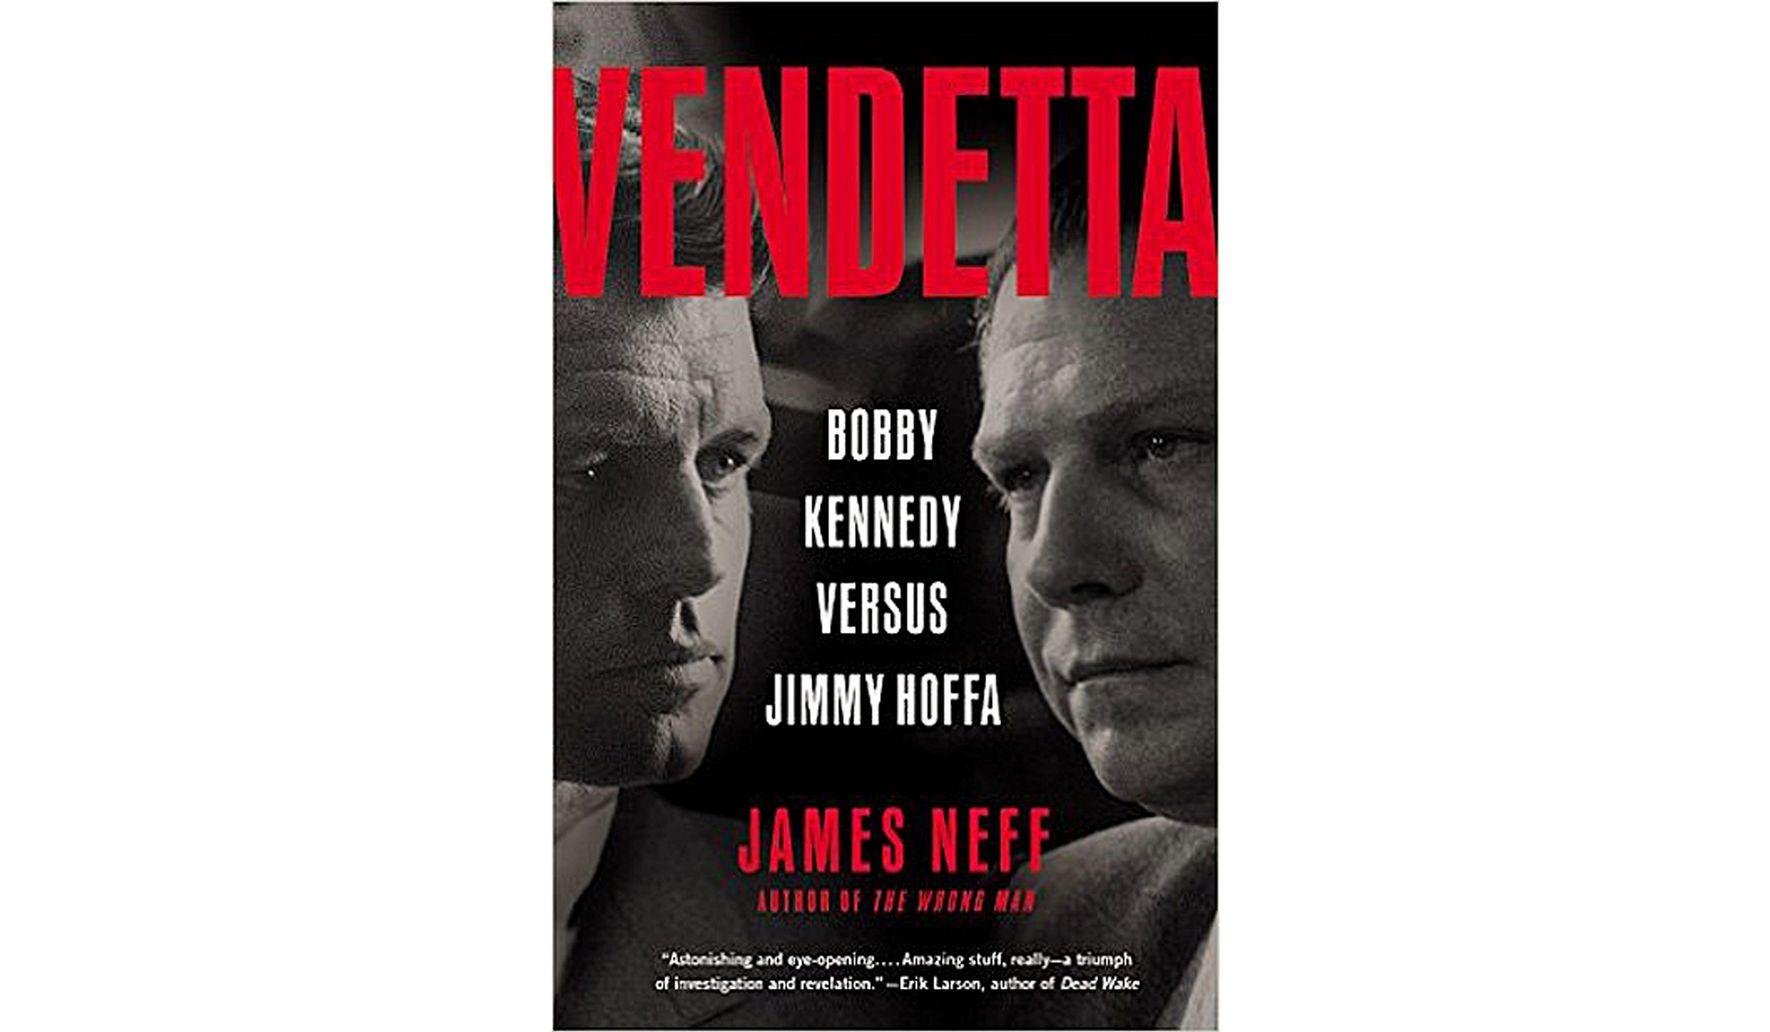 BOOK REVIEW: 'Vendetta: Bobby Kennedy Versus Jimmy Hoffa